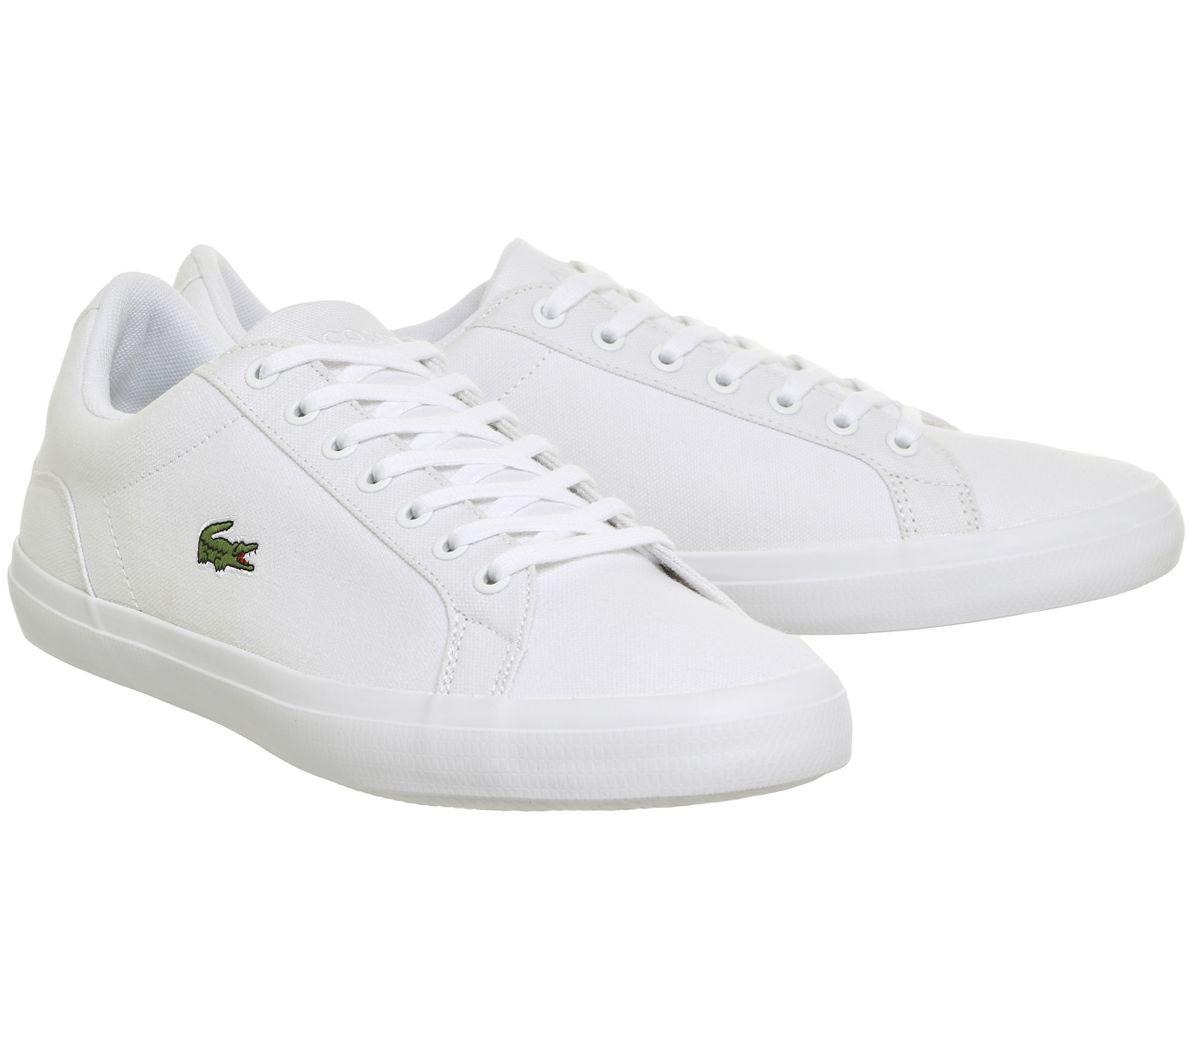 548492c396eb Lacoste Lerond White Canvas - His trainers